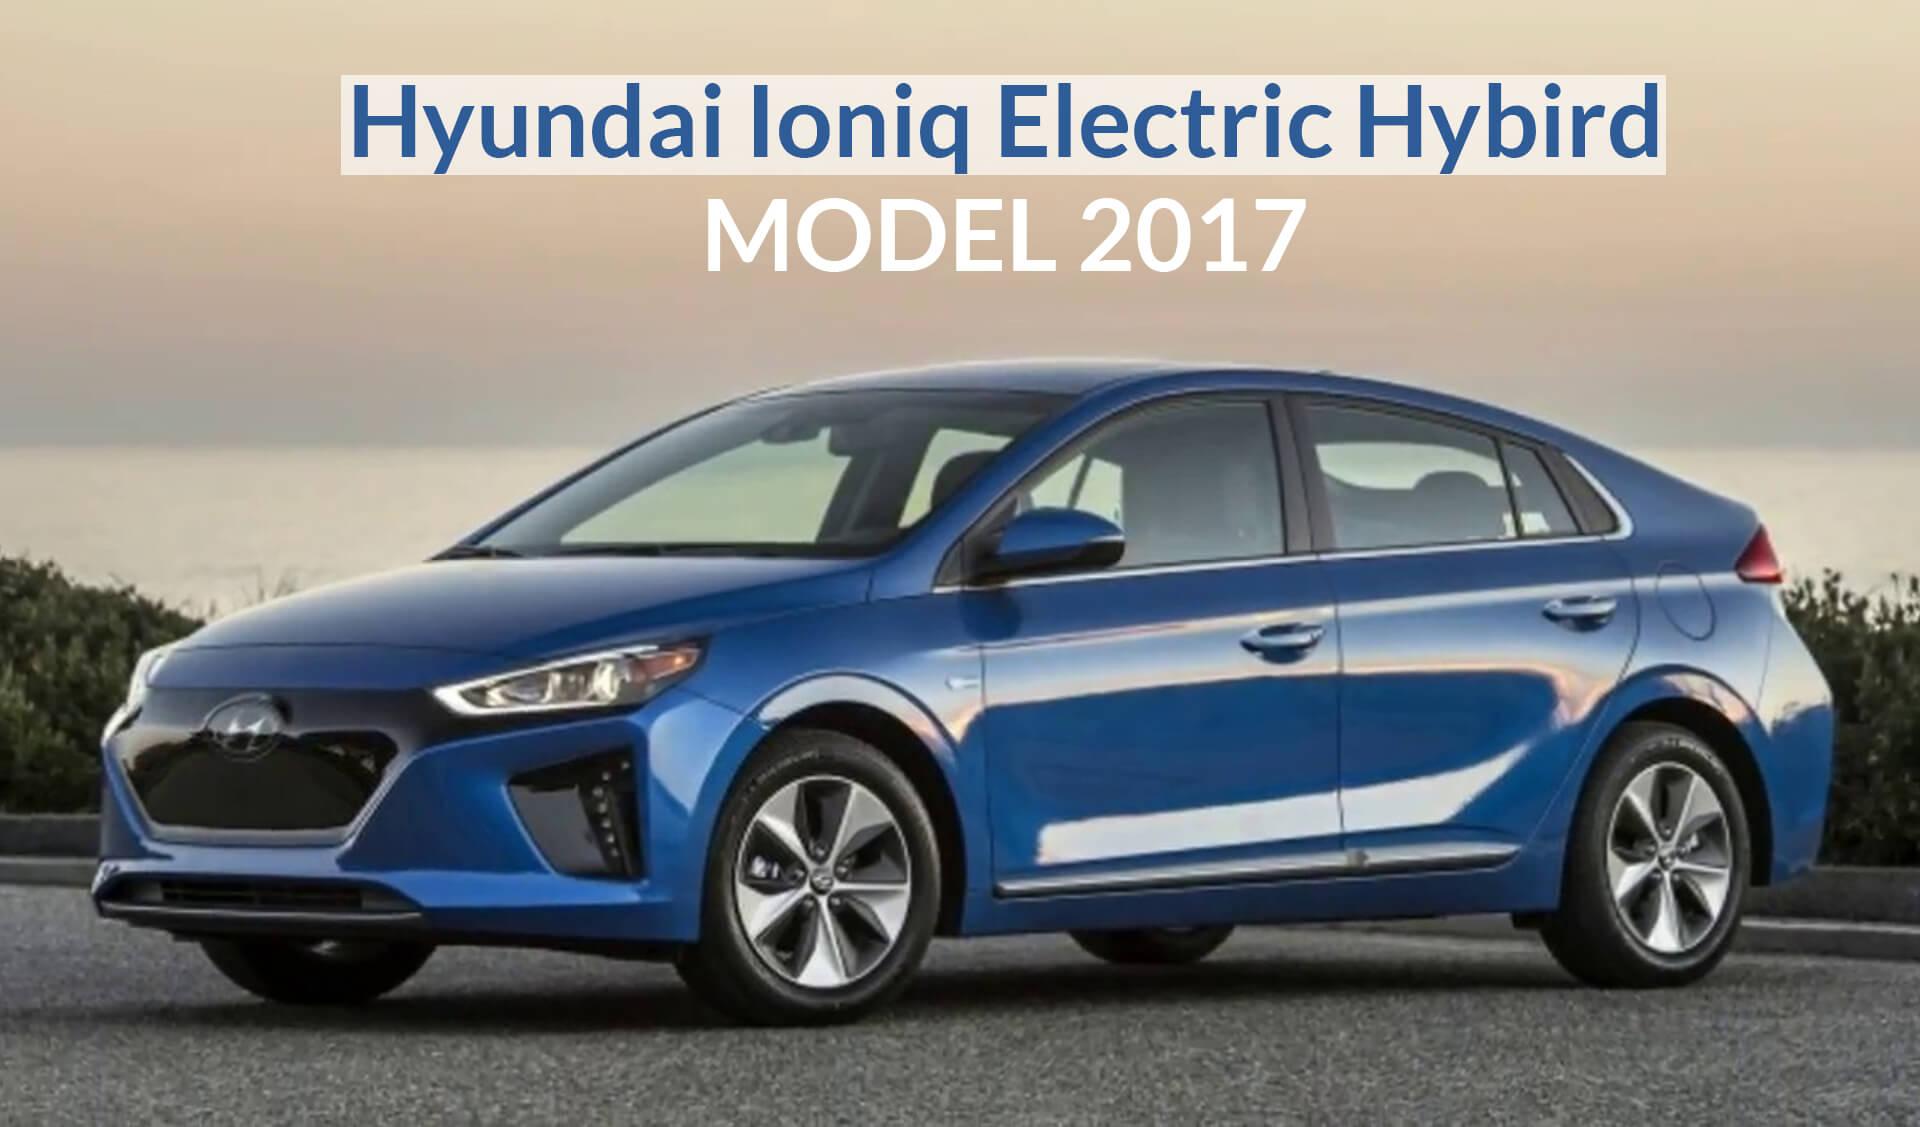 hyundai ioniq electric hybird model 2017 ebuddynews. Black Bedroom Furniture Sets. Home Design Ideas